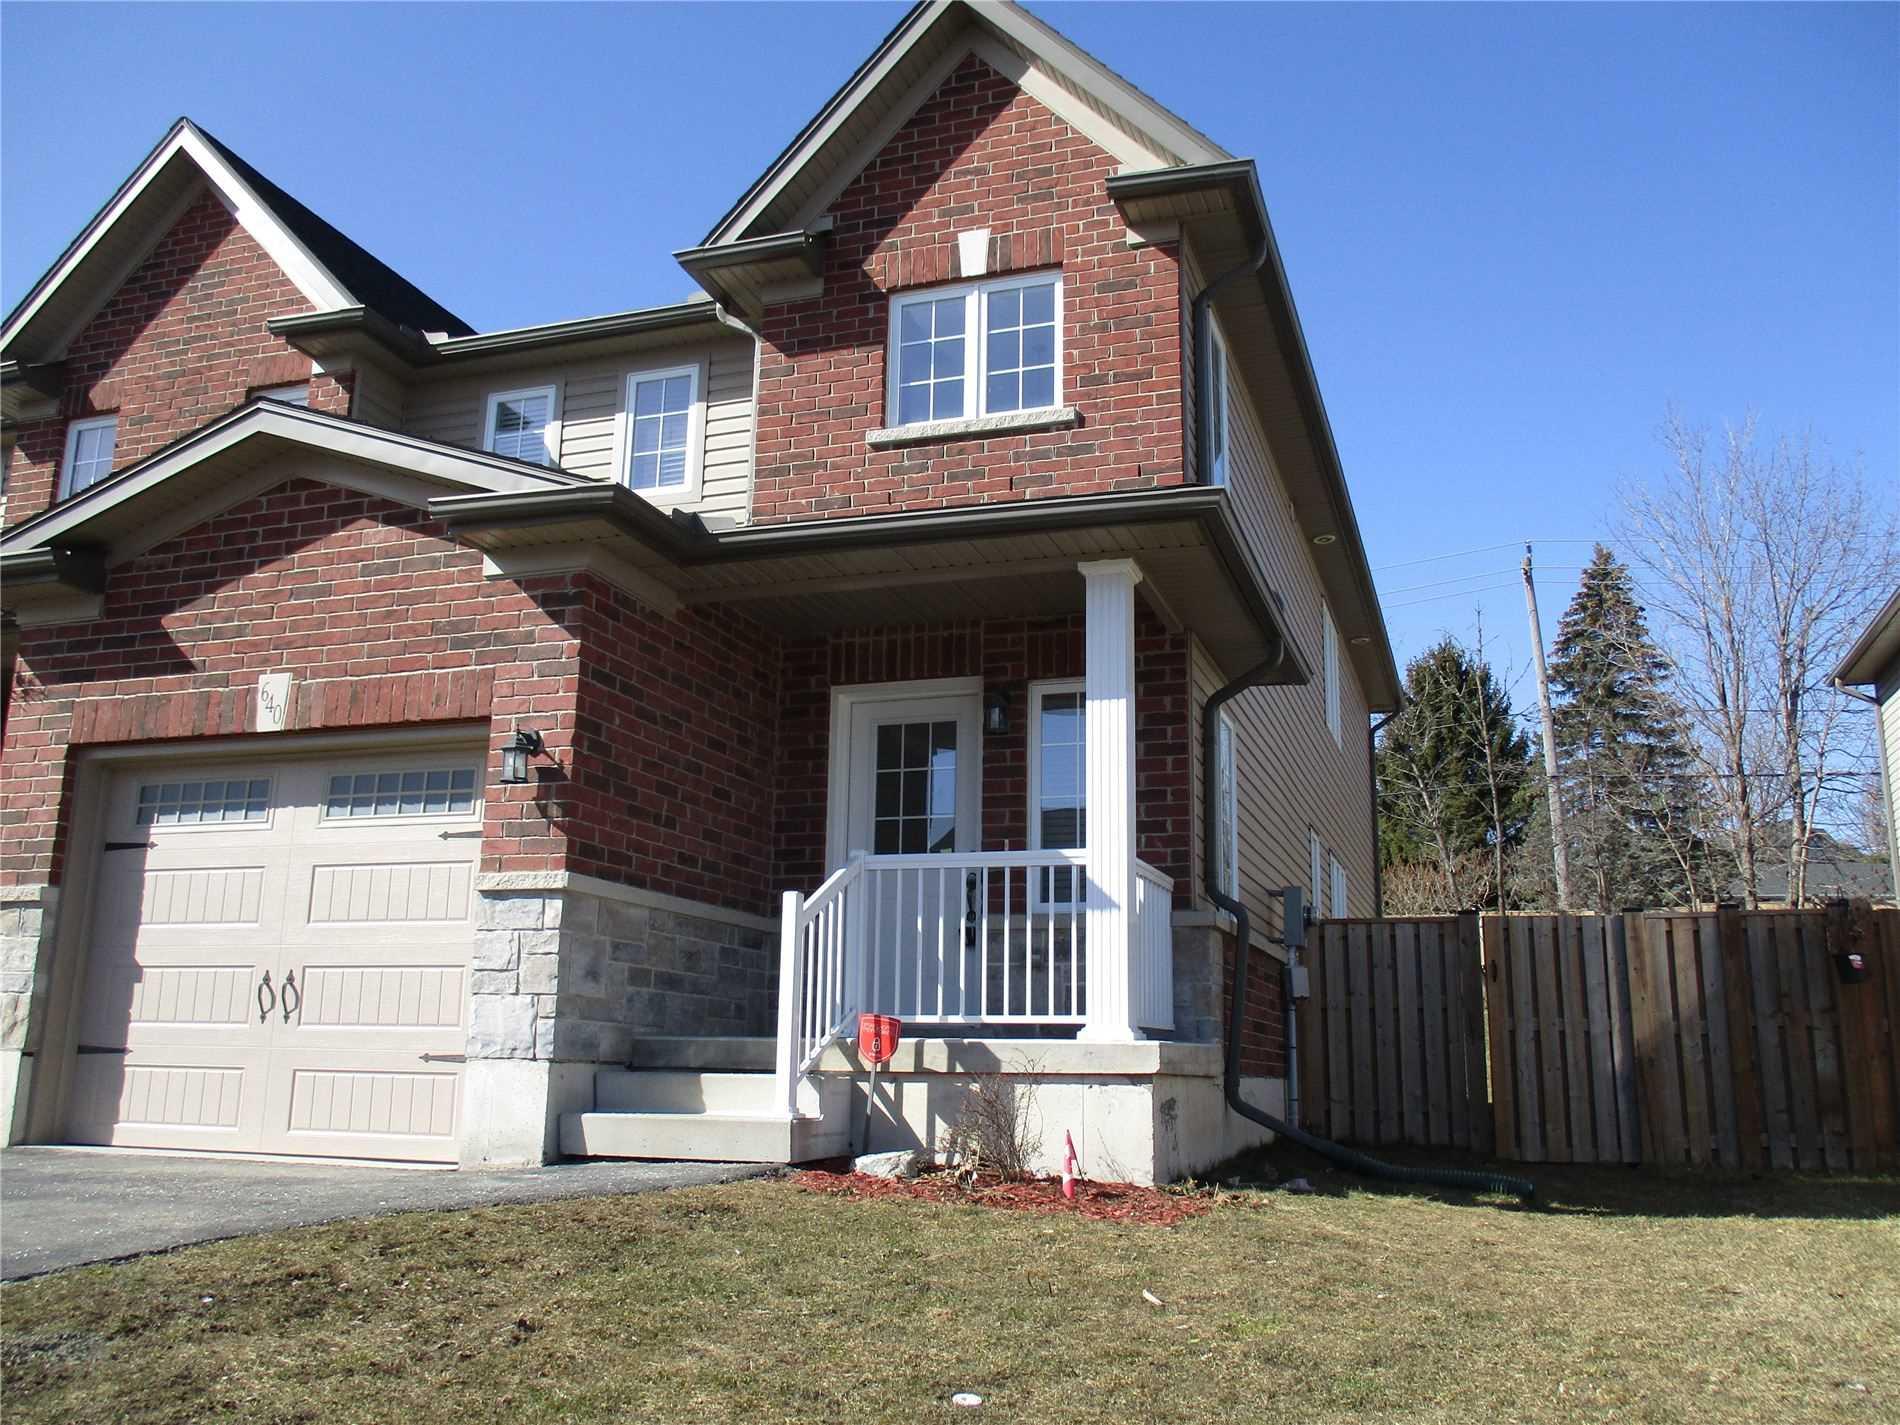 640 Crawford Cres, Woodstock, Ontario N4S0B6, 3 Bedrooms Bedrooms, ,3 BathroomsBathrooms,Att/row/twnhouse,For Lease,Crawford,X5161294